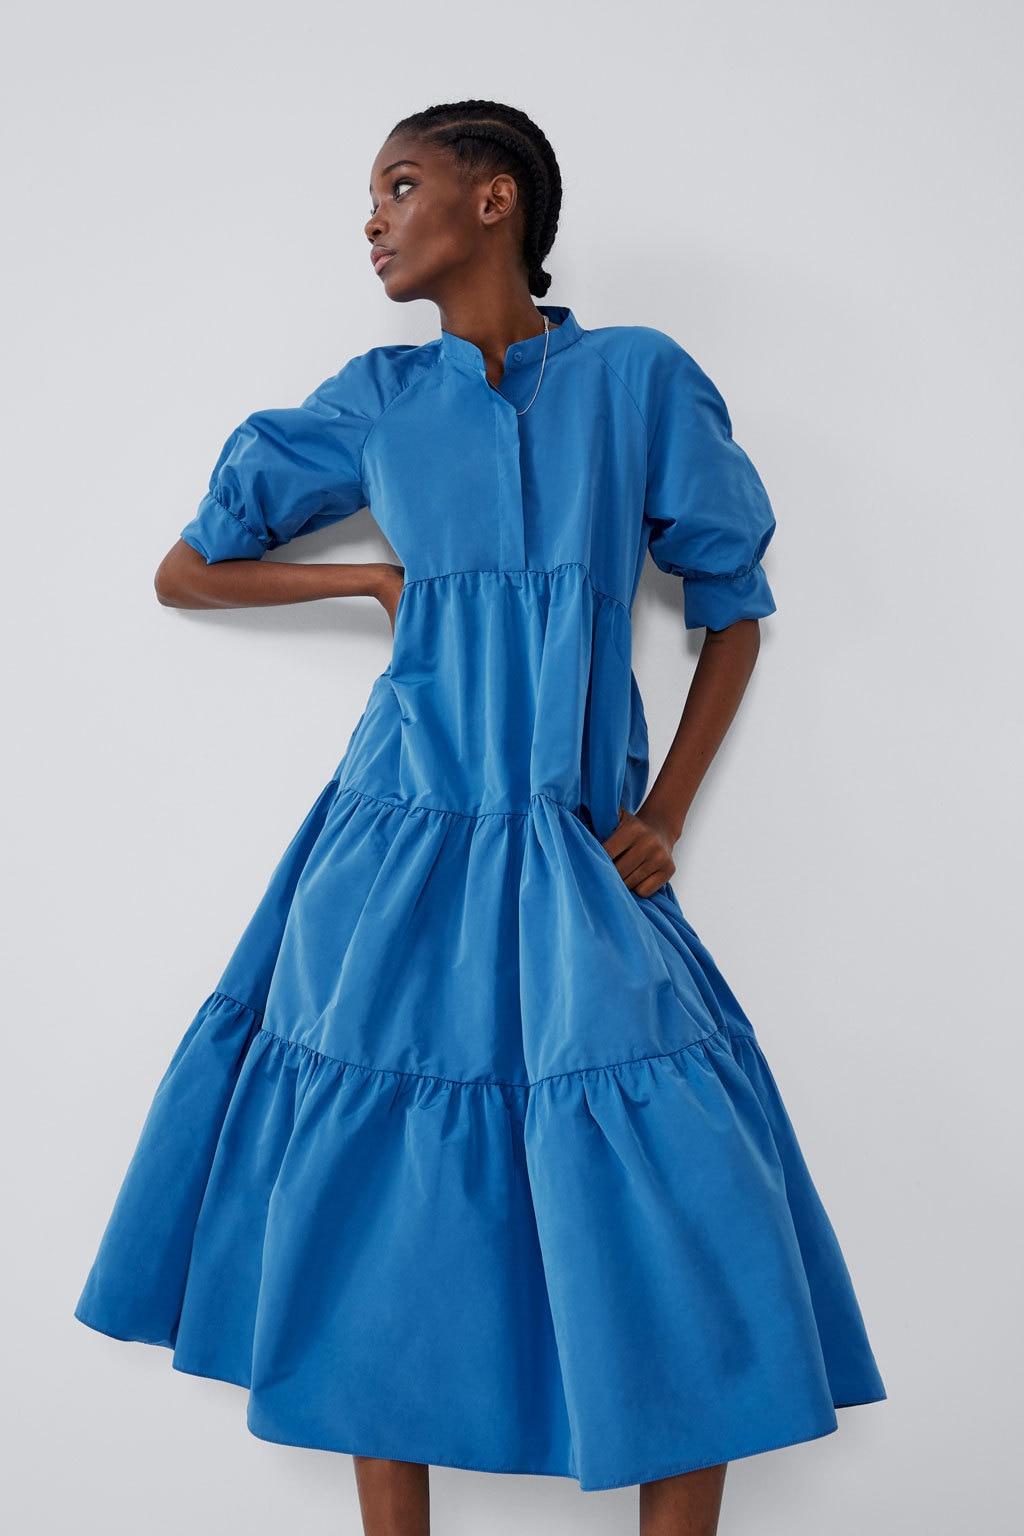 New Women's Autumn Puff Loose Dress ZAraing Vadiming Sheining Women Female Dress 2020 New Streetwear